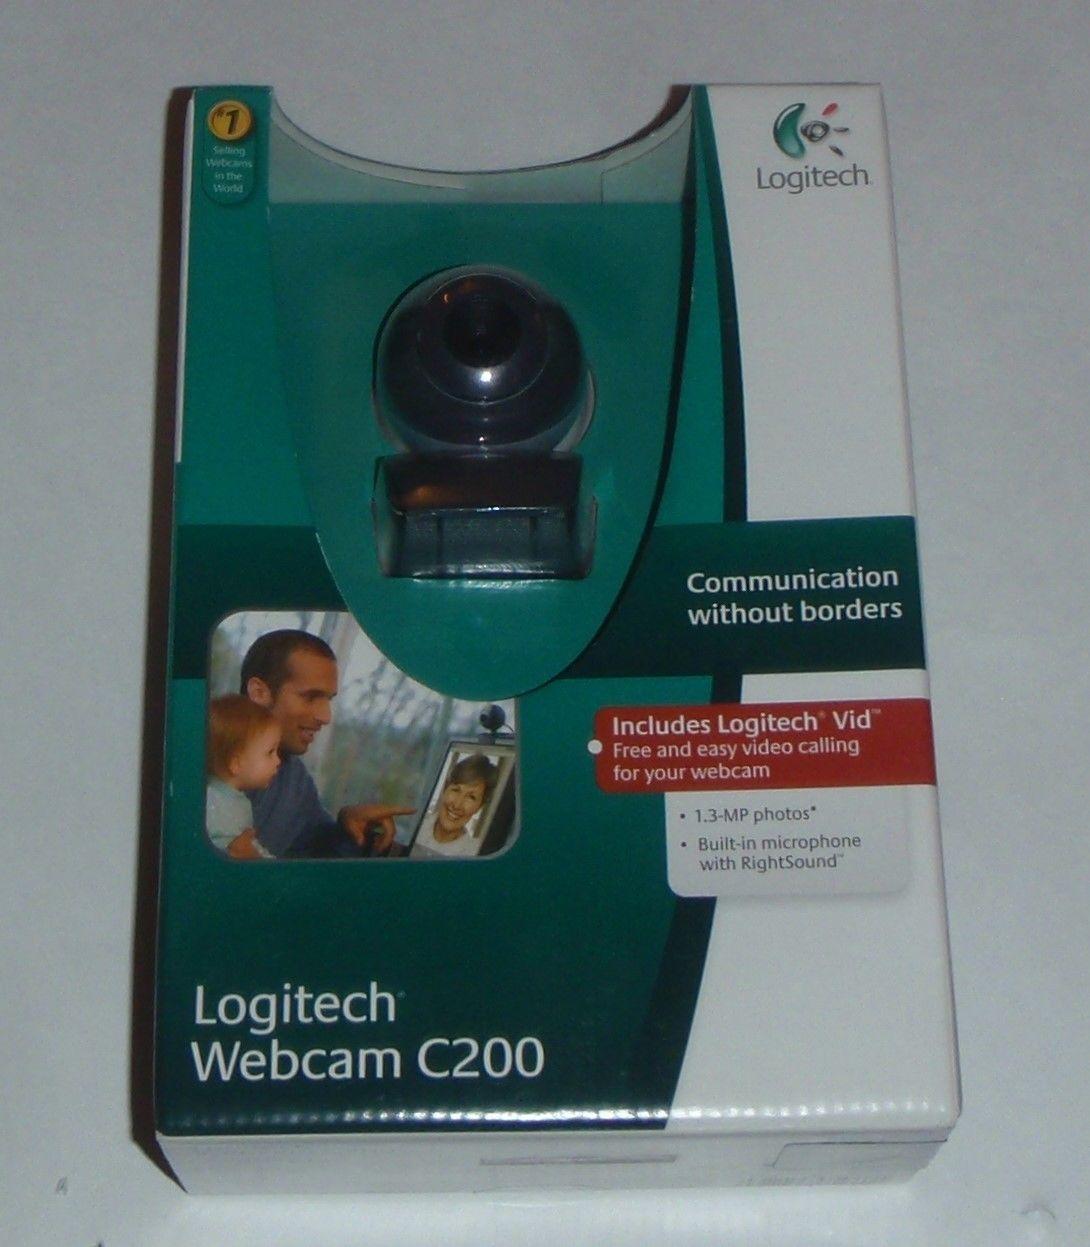 1c2c2cc7fb9 New NWB Logitech C200 1.3 - MP Photos Webcam and 20 similar items. S l1600